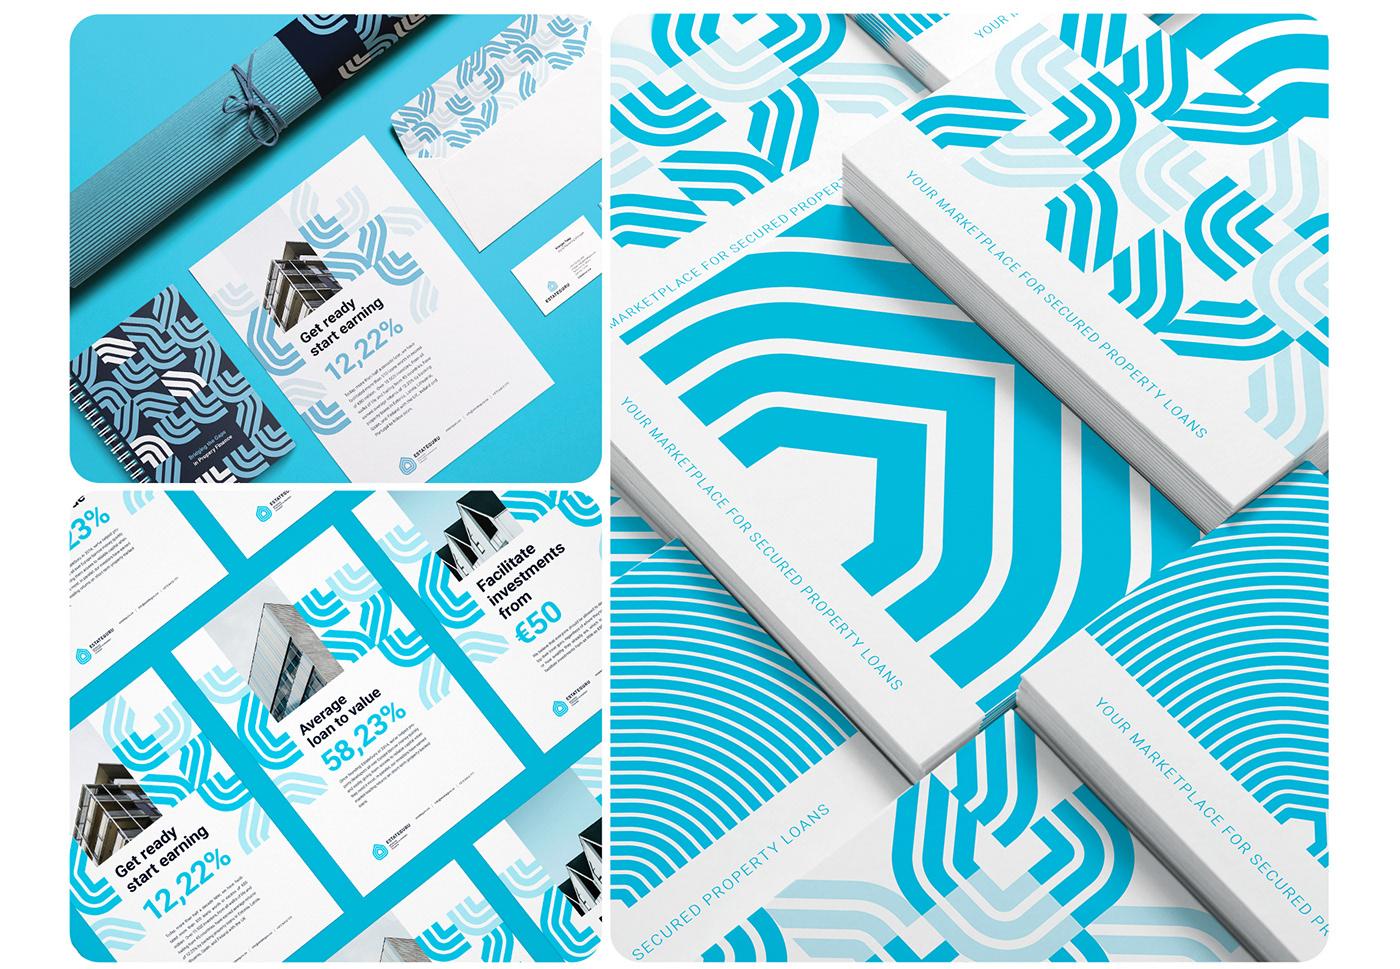 identity branding  Ico visual identity brand identity visual guidelines logo guidelines artkai crypto brand guidelines